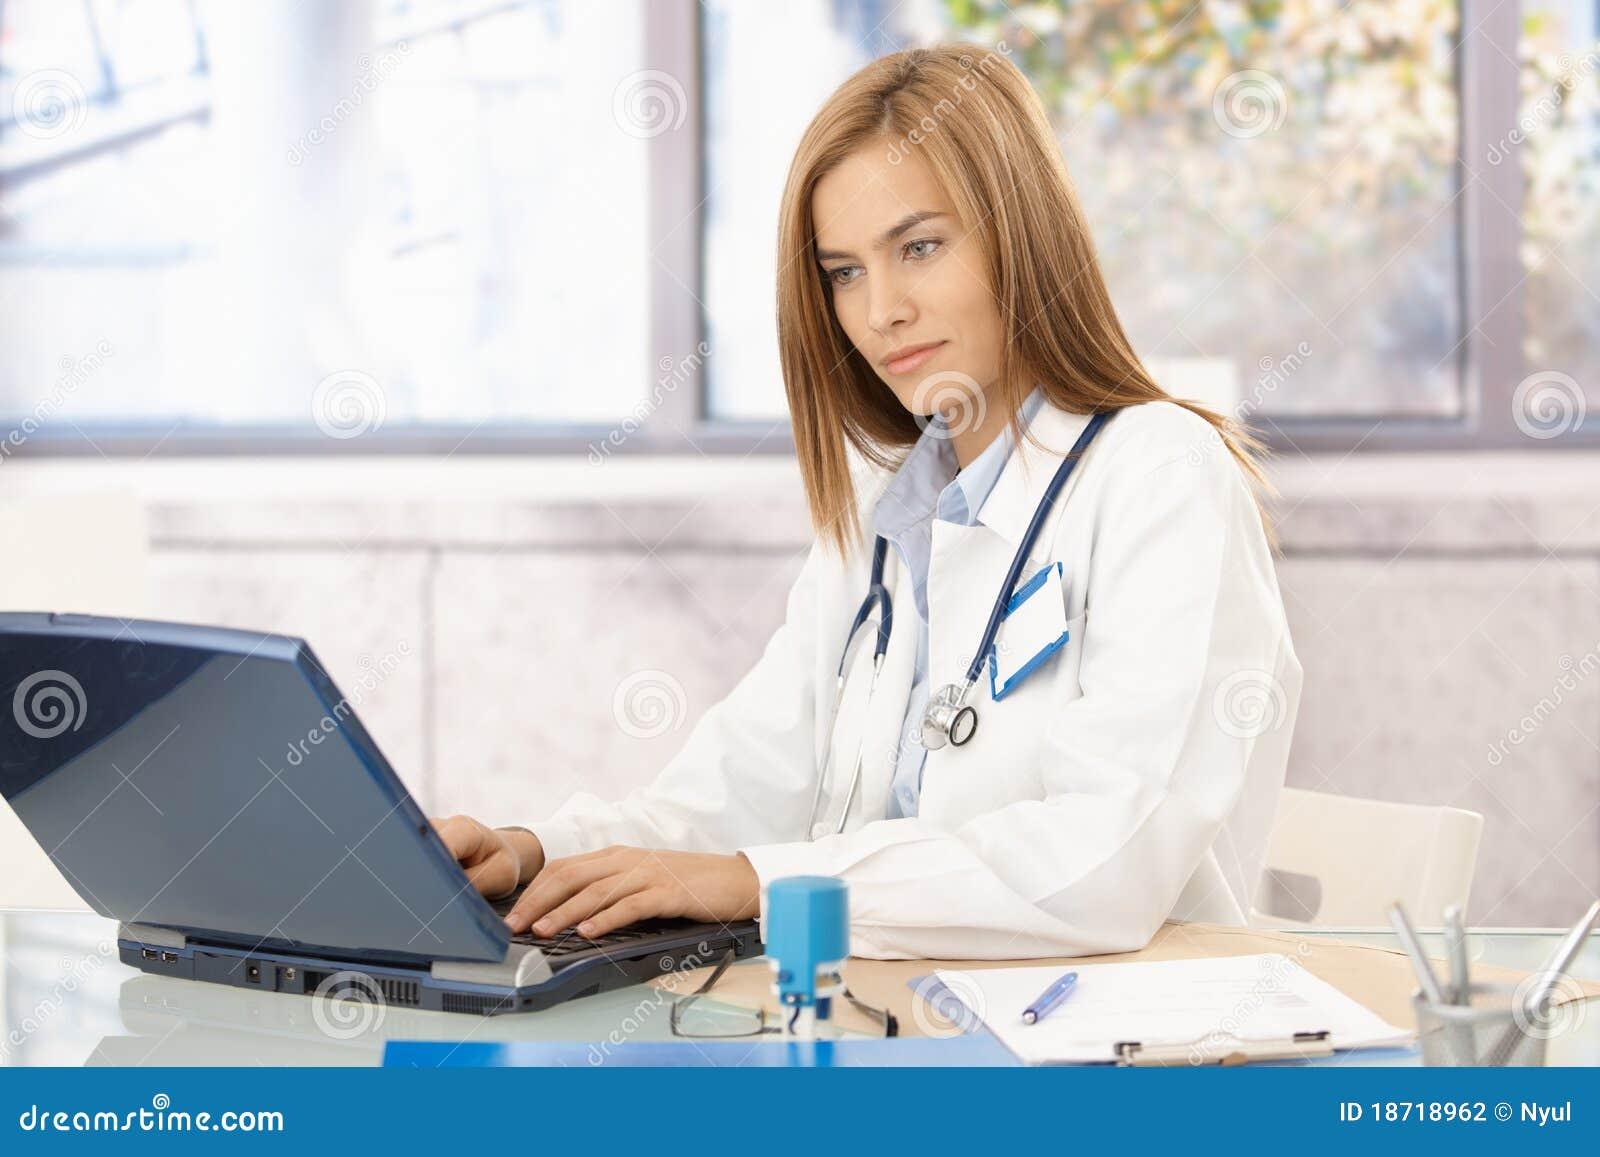 Doctor joven ocupado en oficina usando la computadora port til fotograf a de archivo imagen - Sexo en la oficina ...